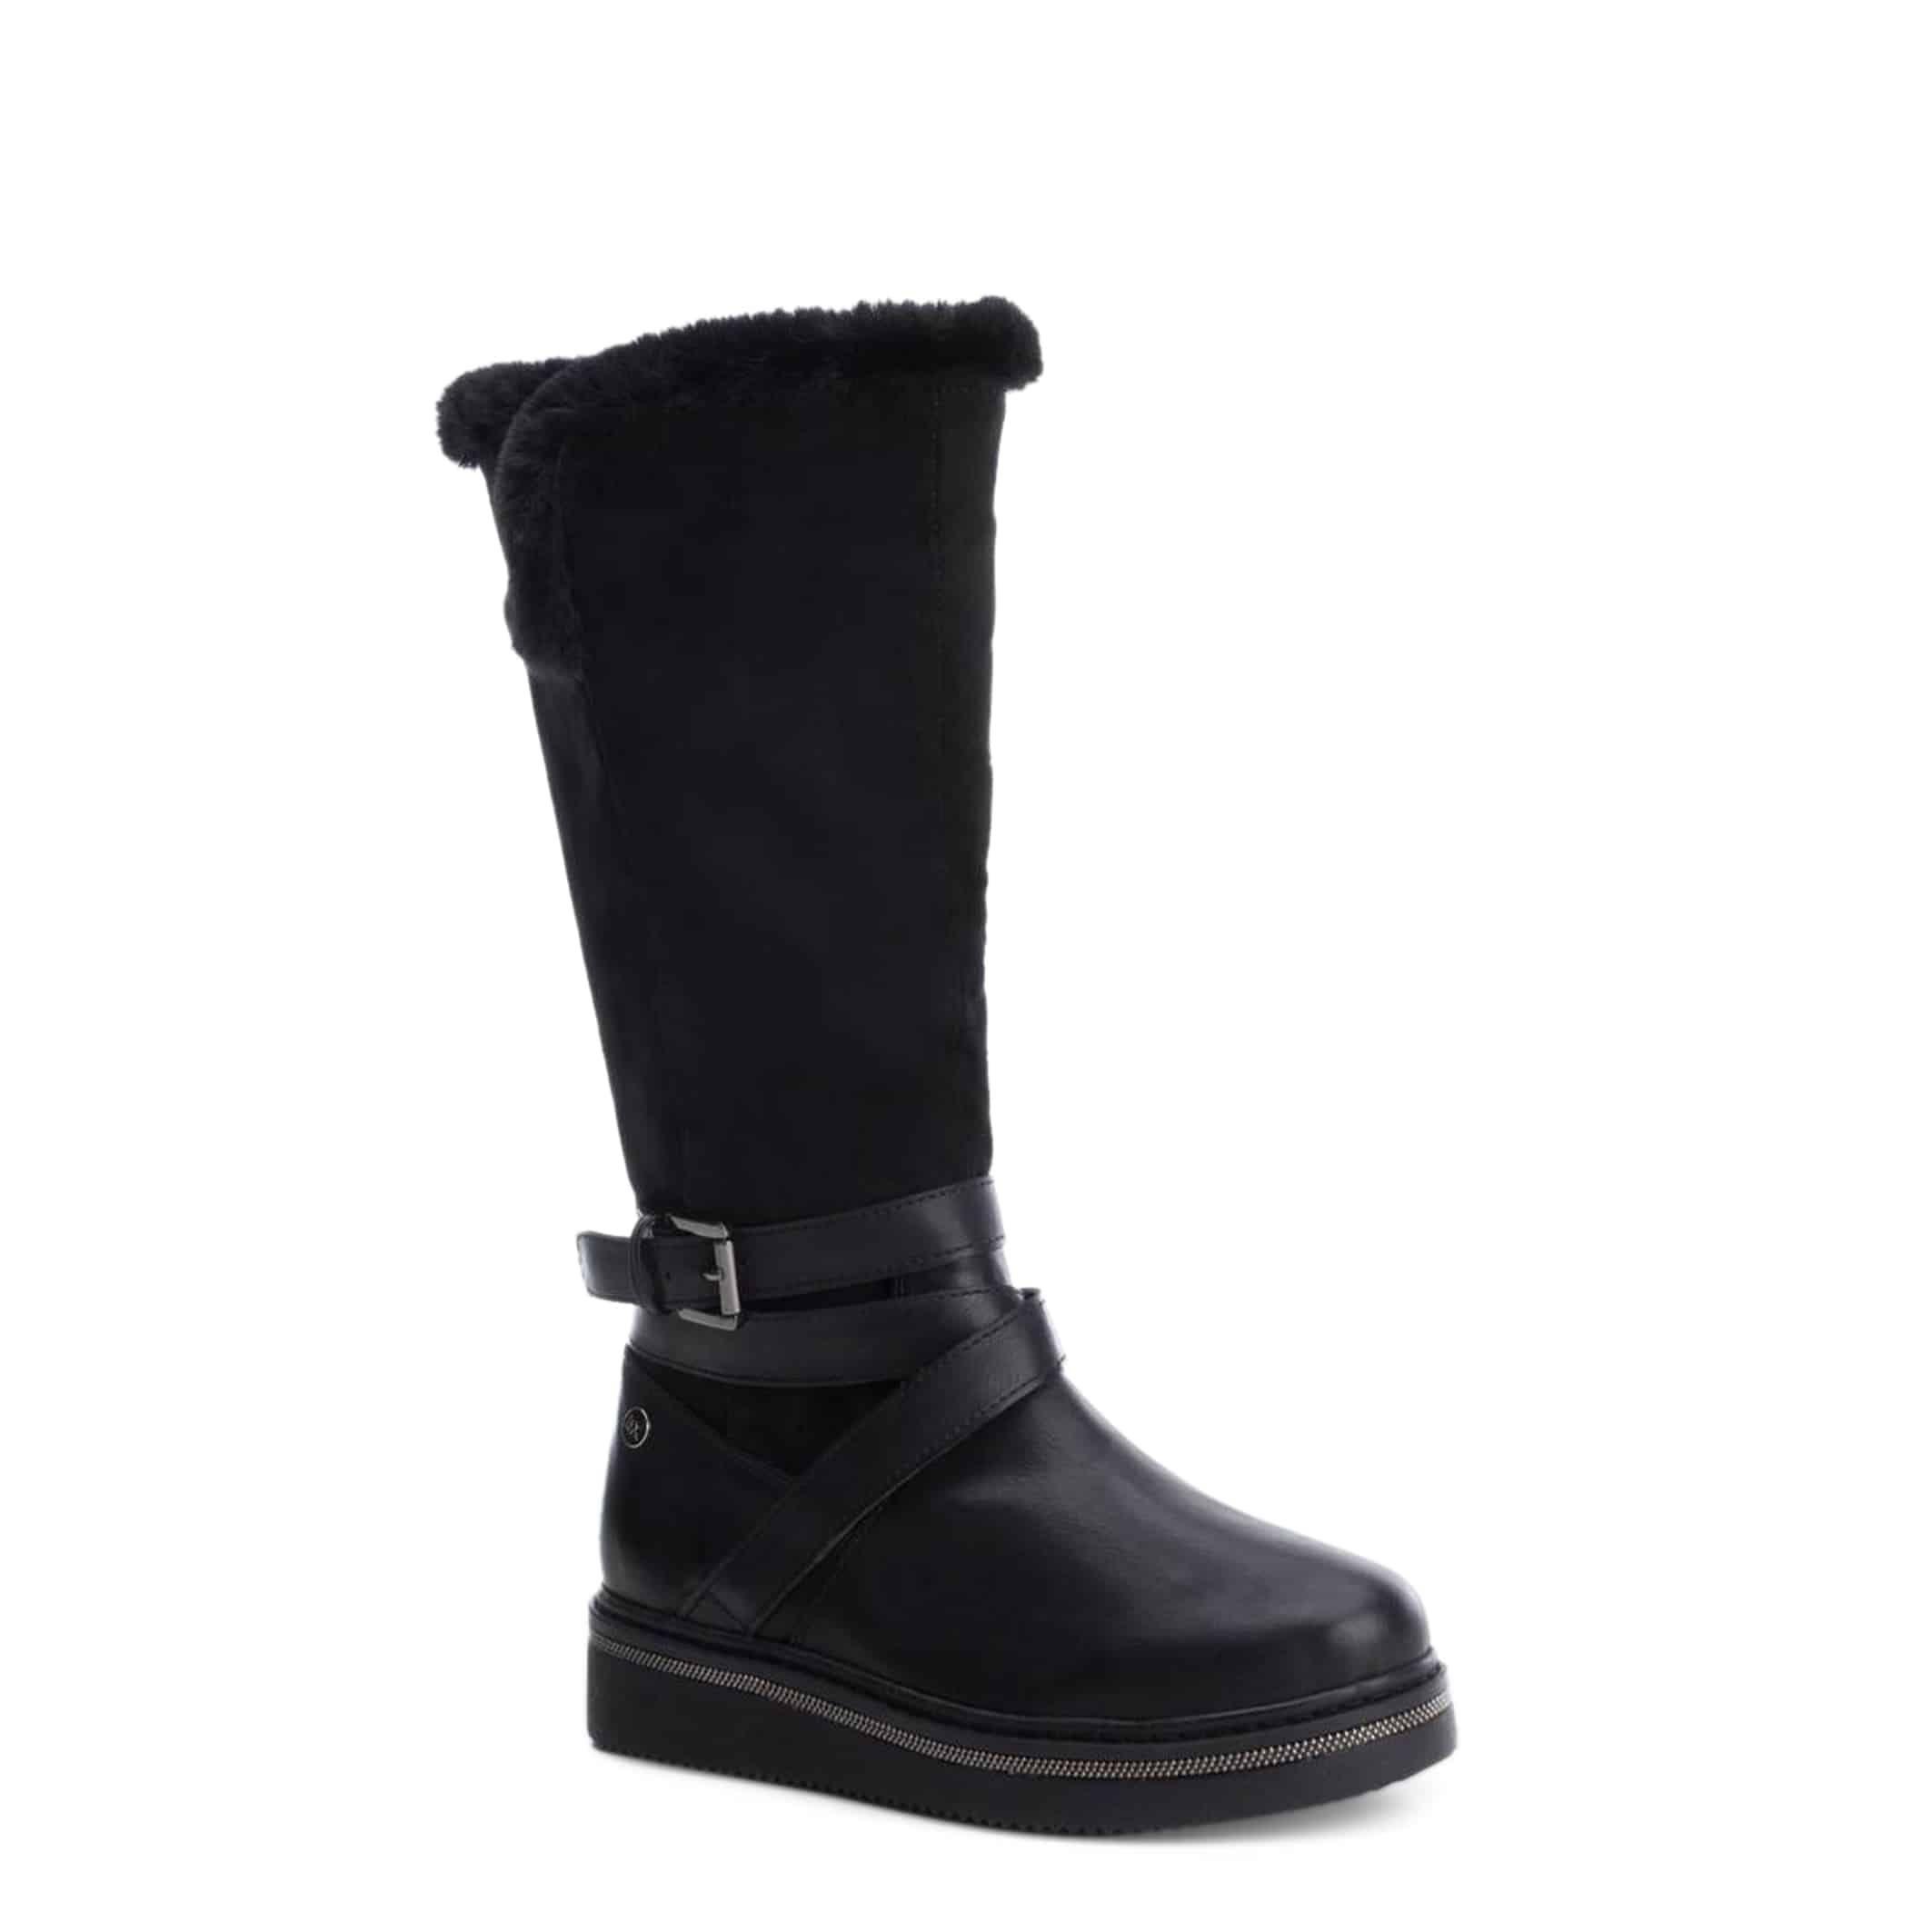 Schuhe Xti – 48447 – Schwarz